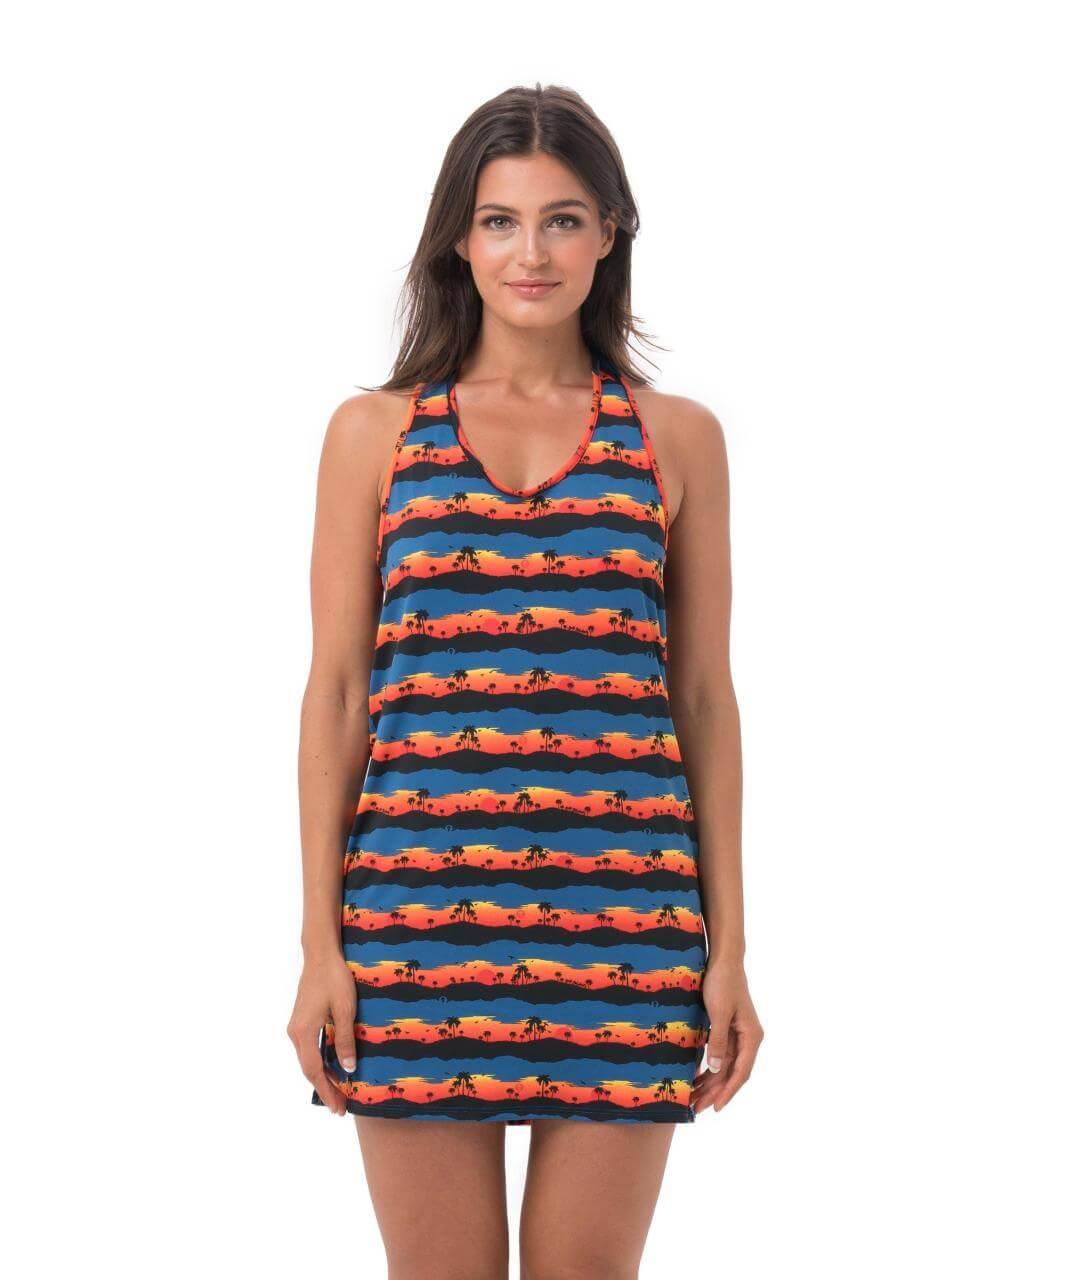 SUNSET PALM FIONA DRESS